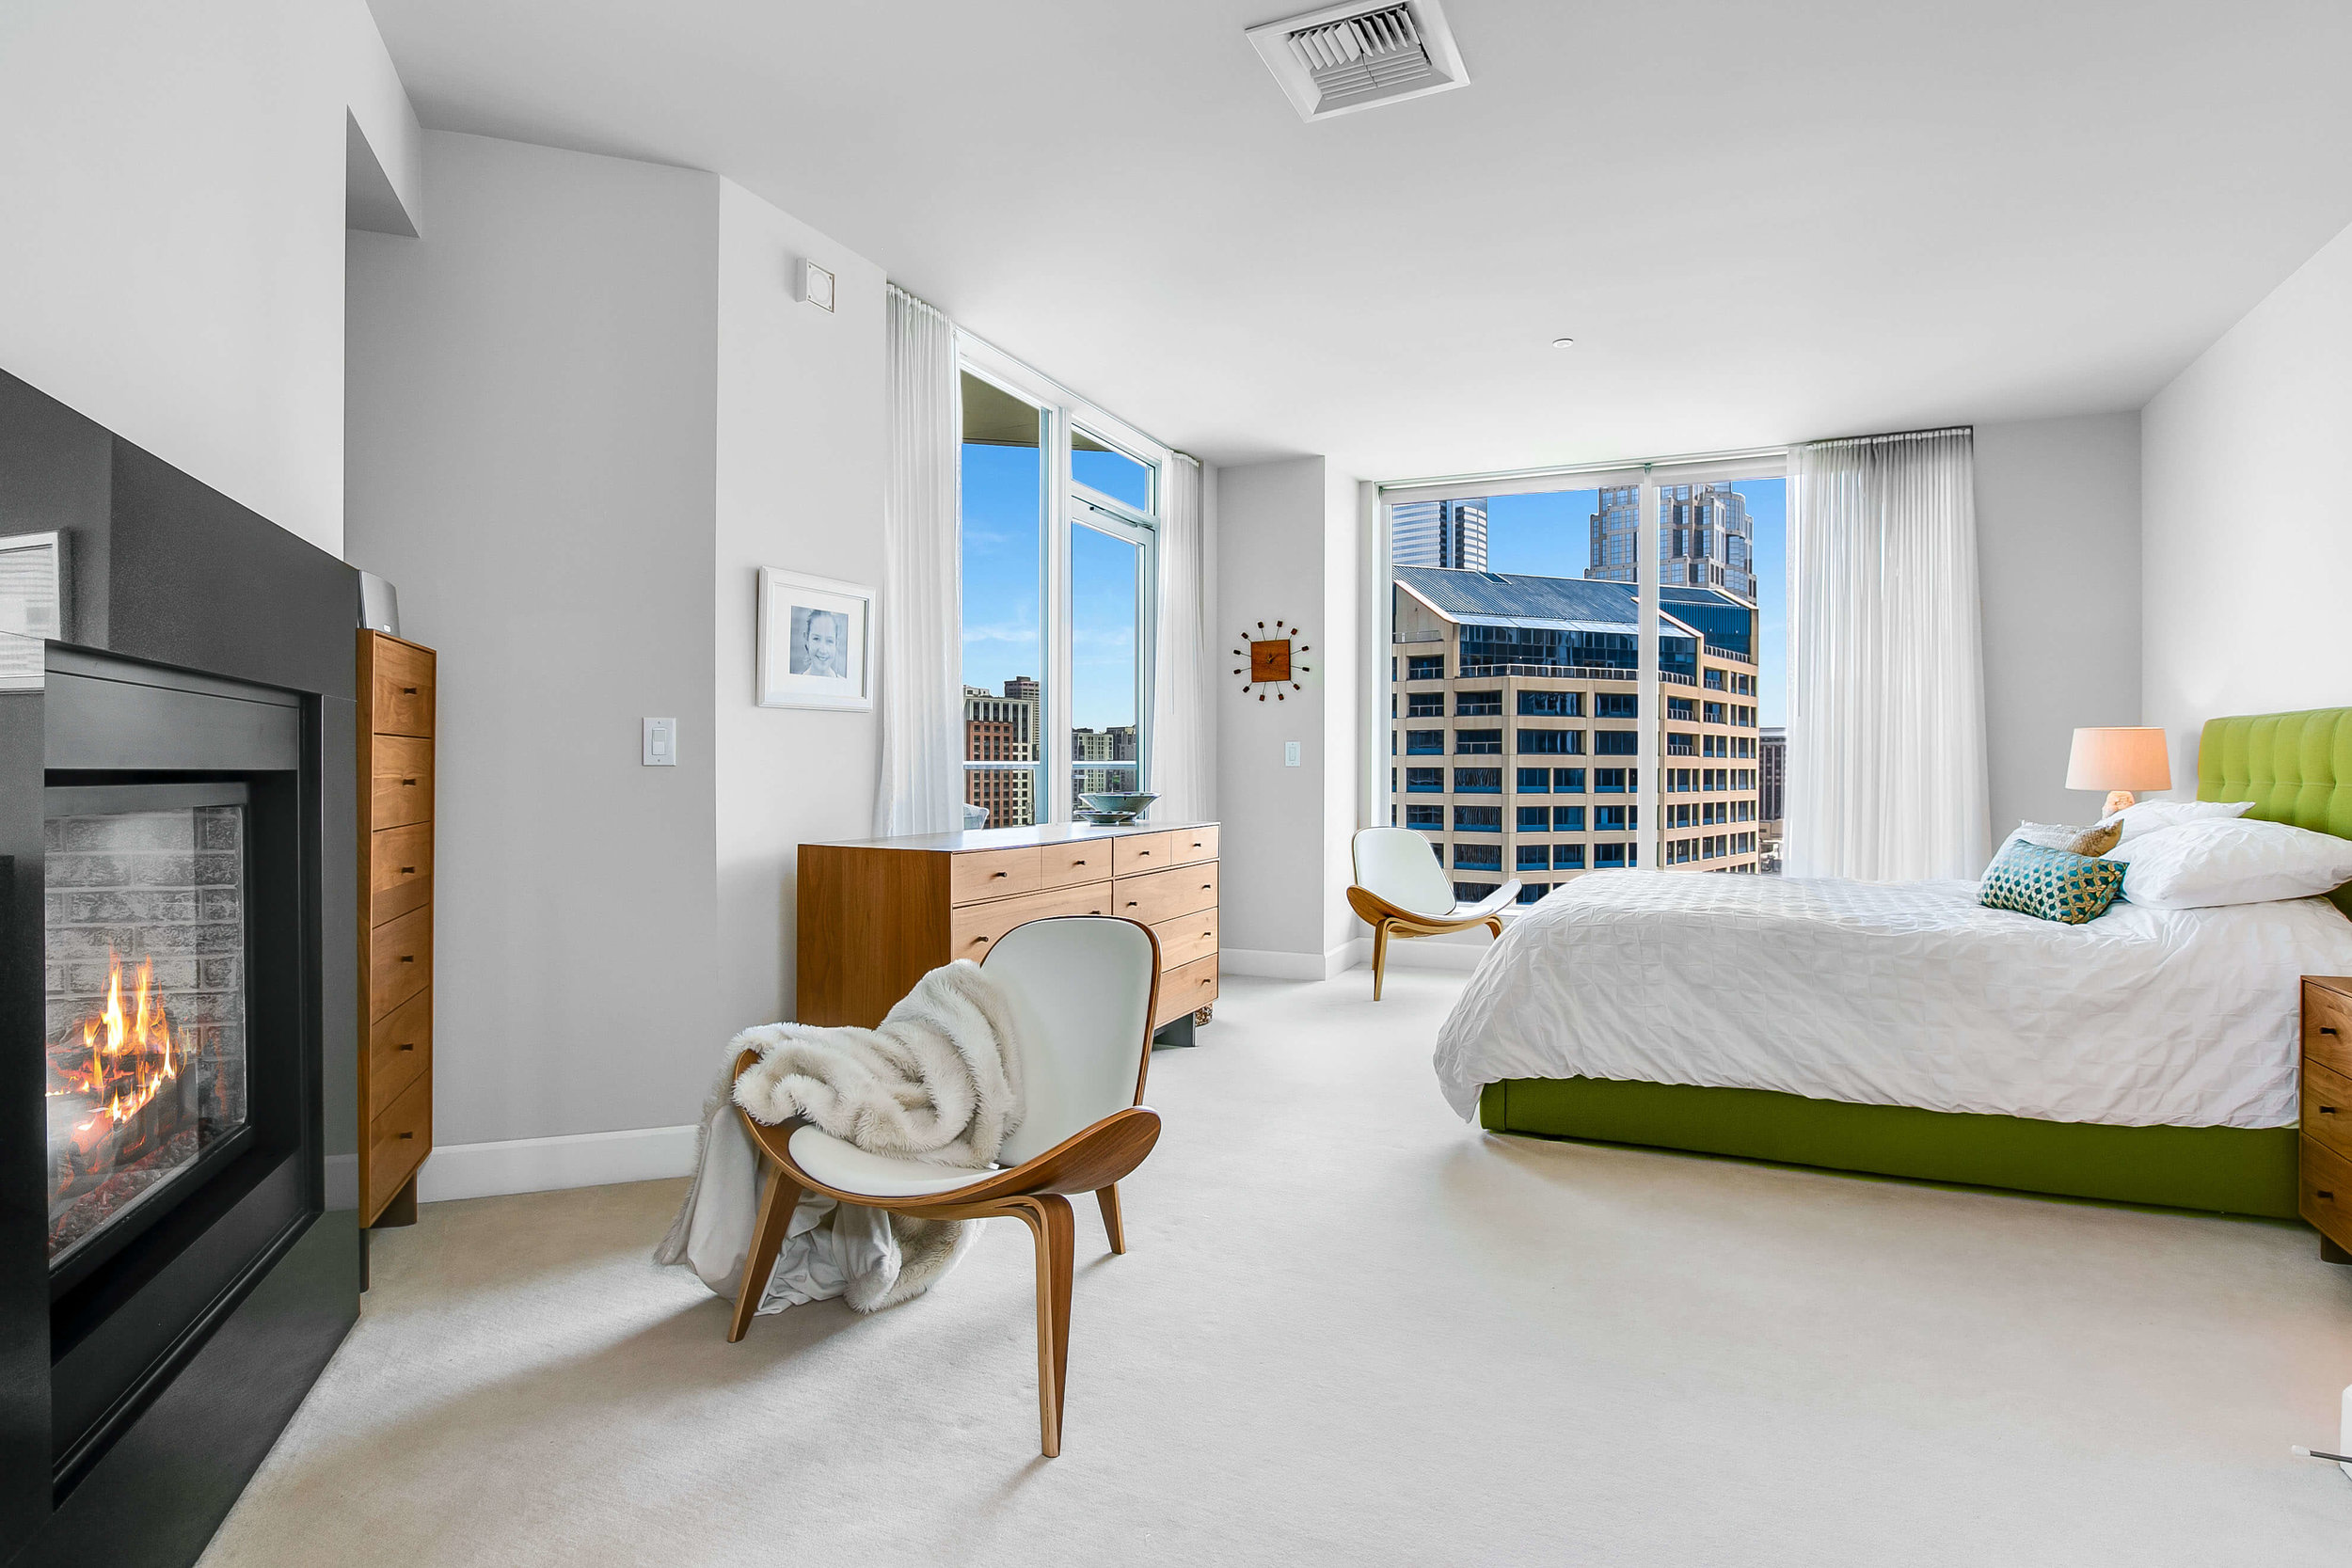 1920-4th-Ave-2406-Seattle-Washington-98101_master-bedroom.jpg